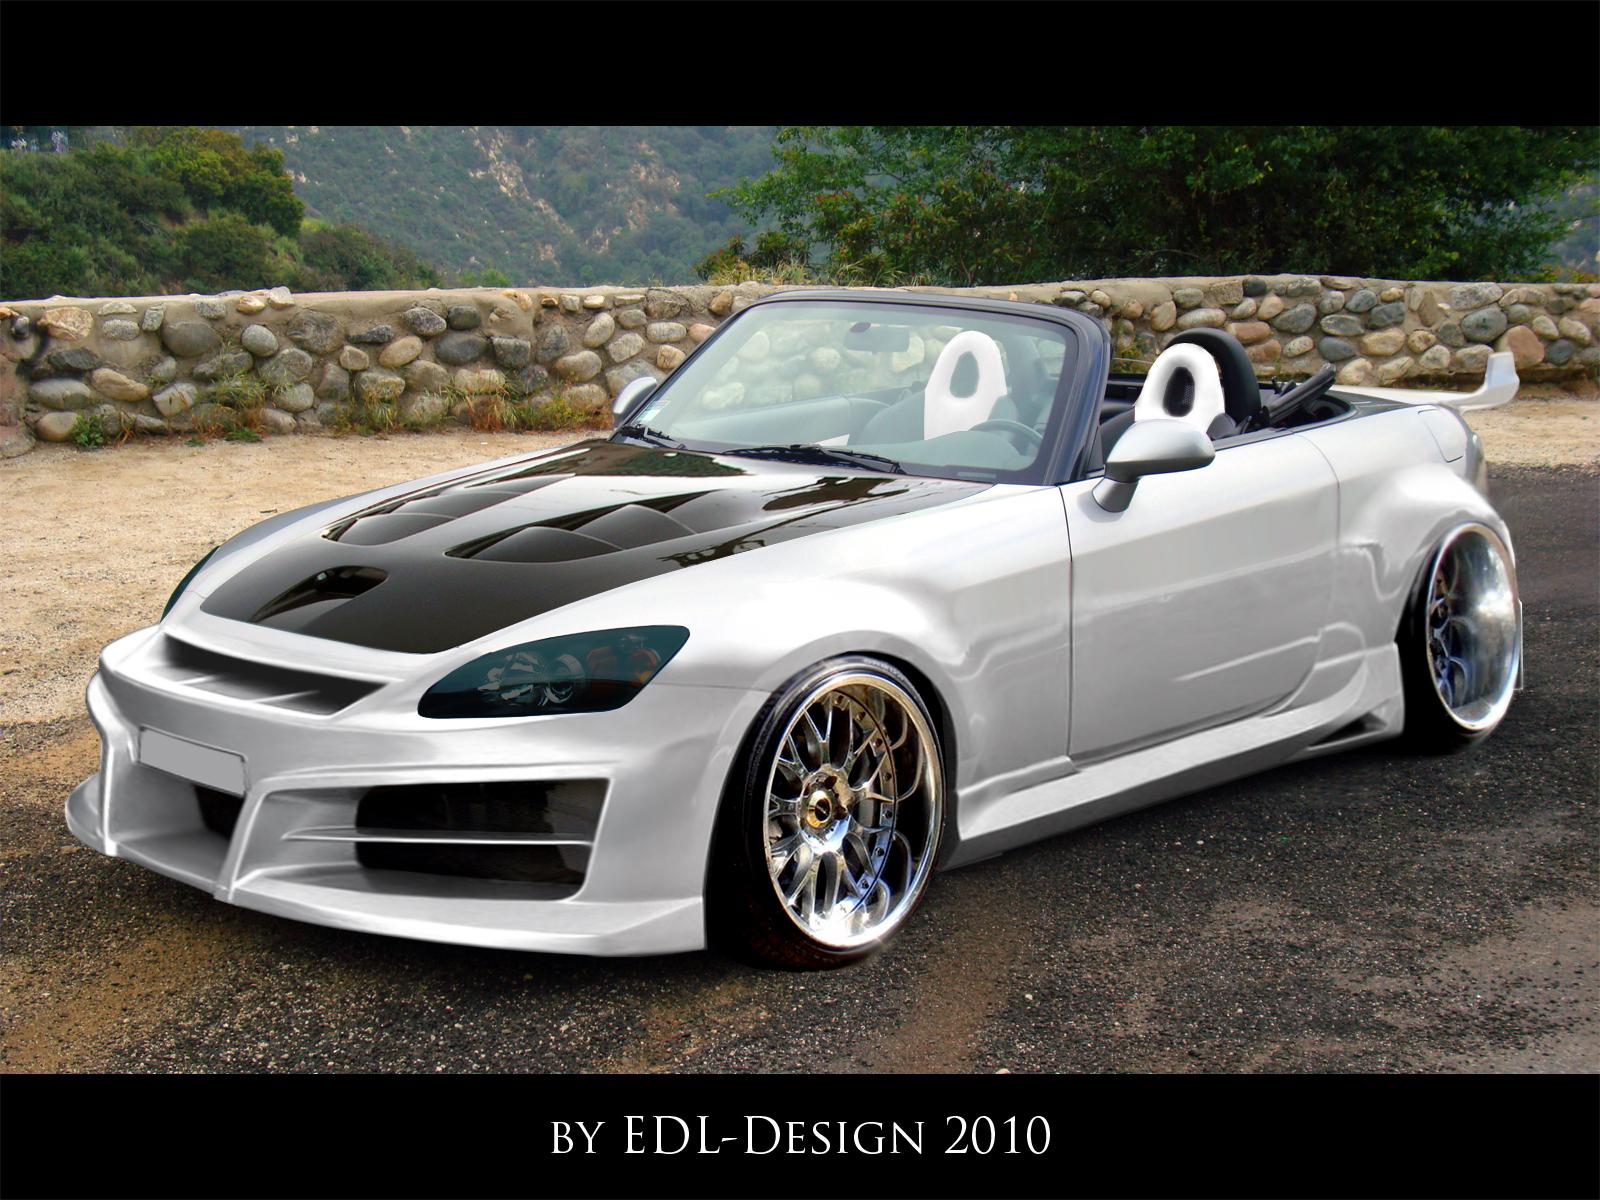 Honda Rubicon 650 Wiring Diagram Edl Designs Profile Automotive Design Studio Feature Chops